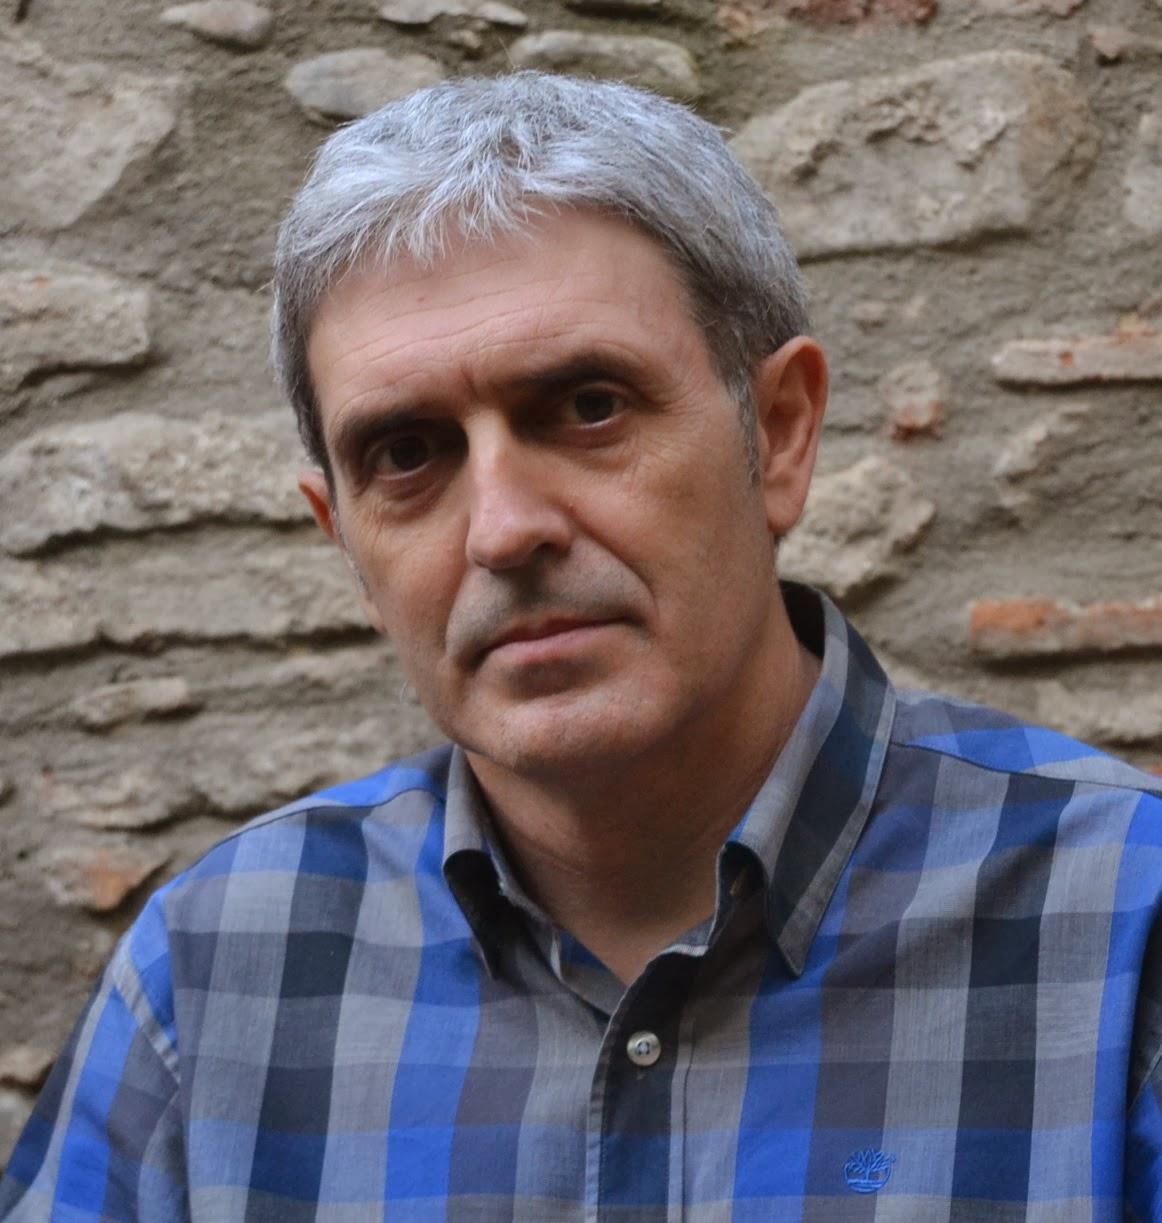 Francisco Morente Valero